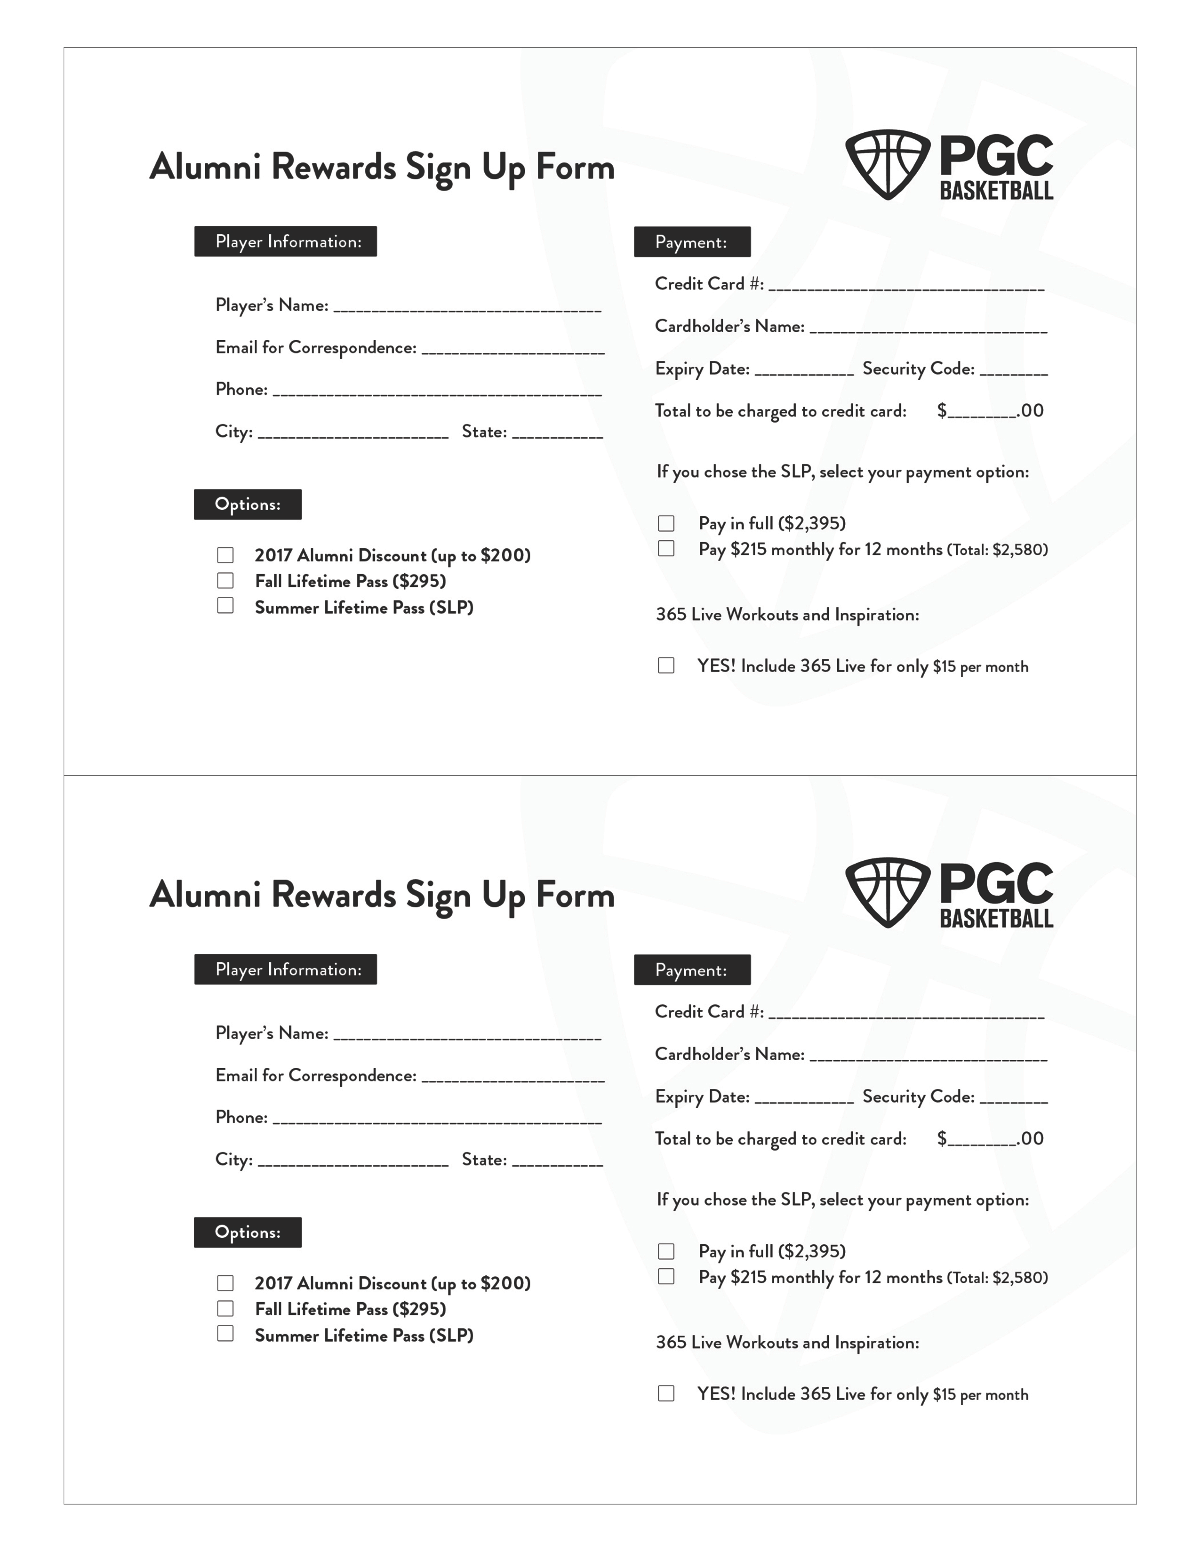 PGC Alumni Rewards Sign up Form